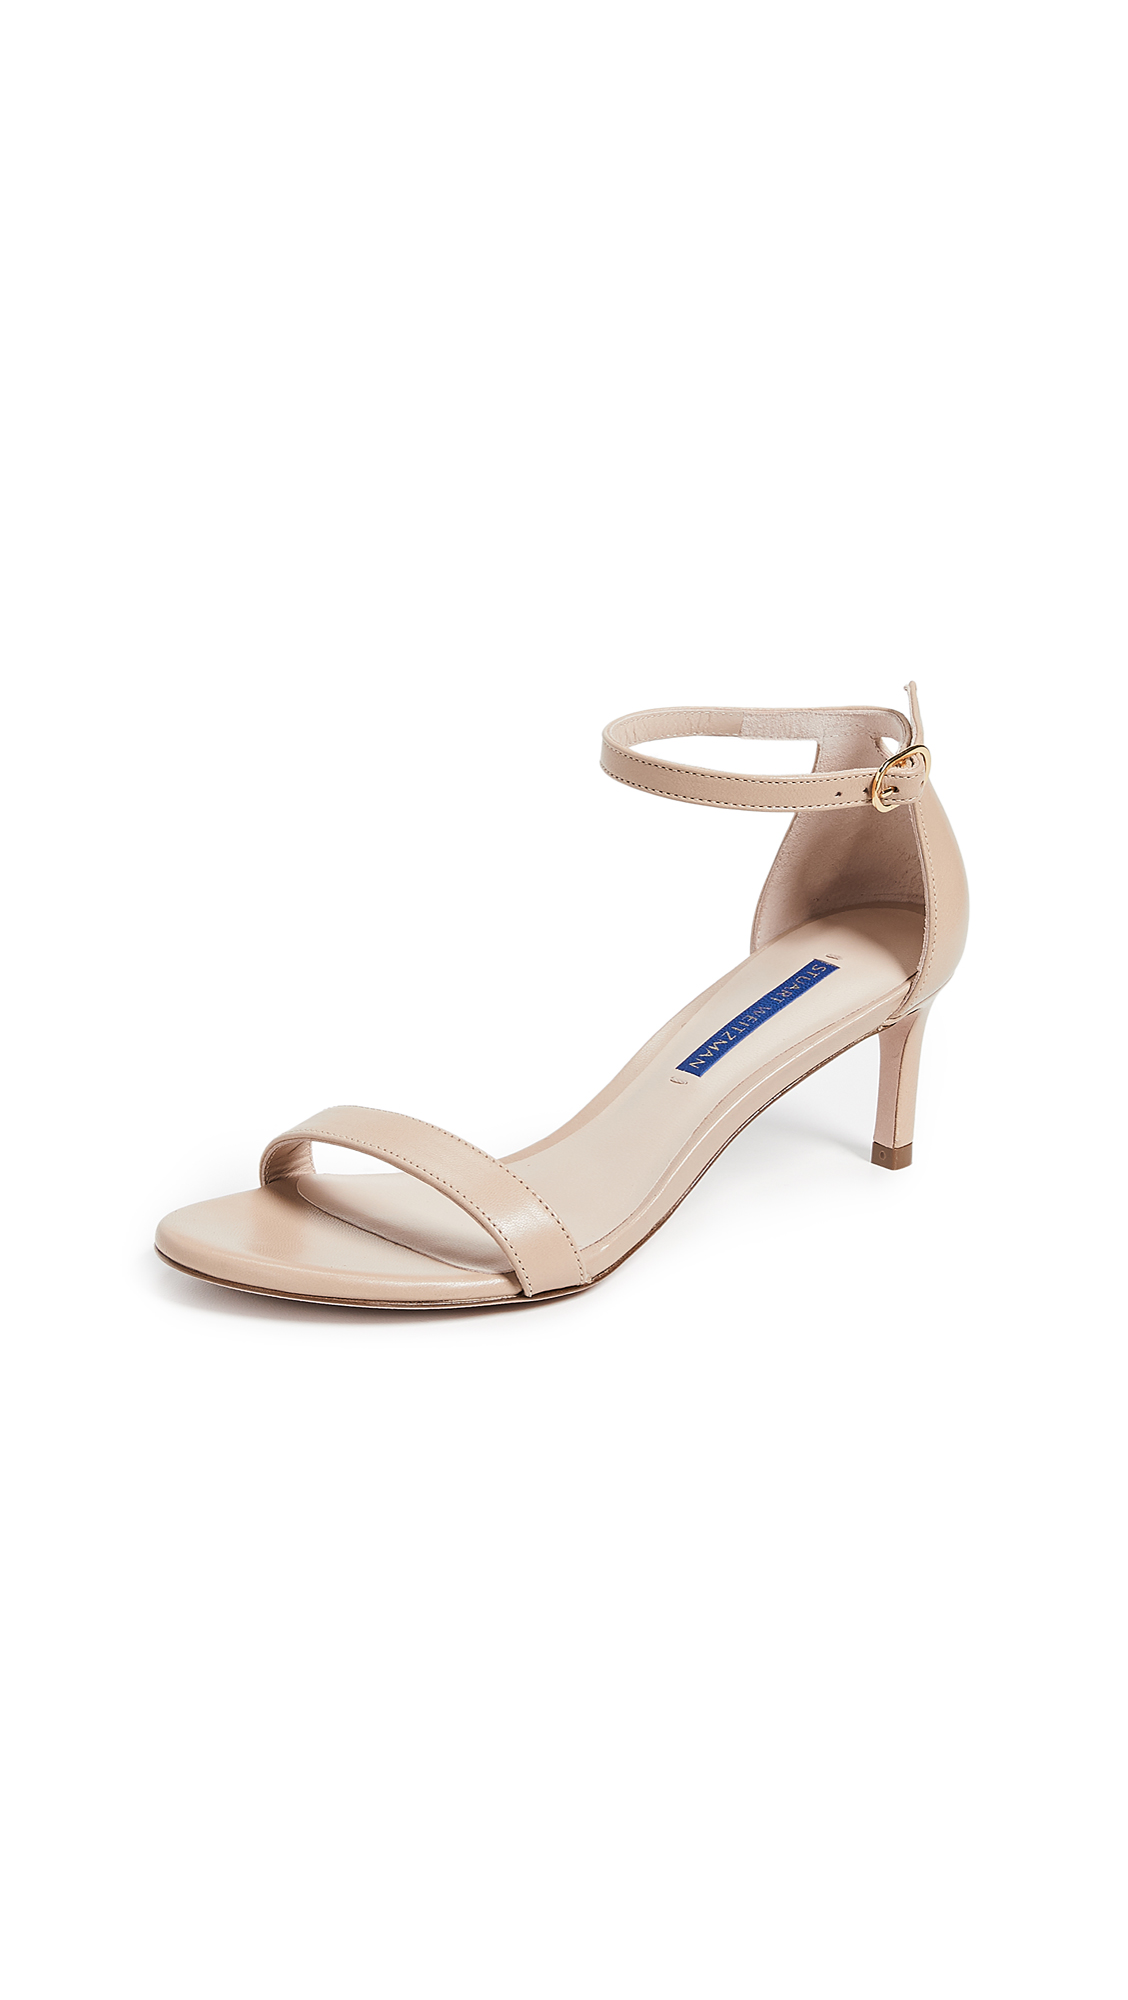 Stuart Weitzman Nunakedstraight 60mm Sandals - Adobe